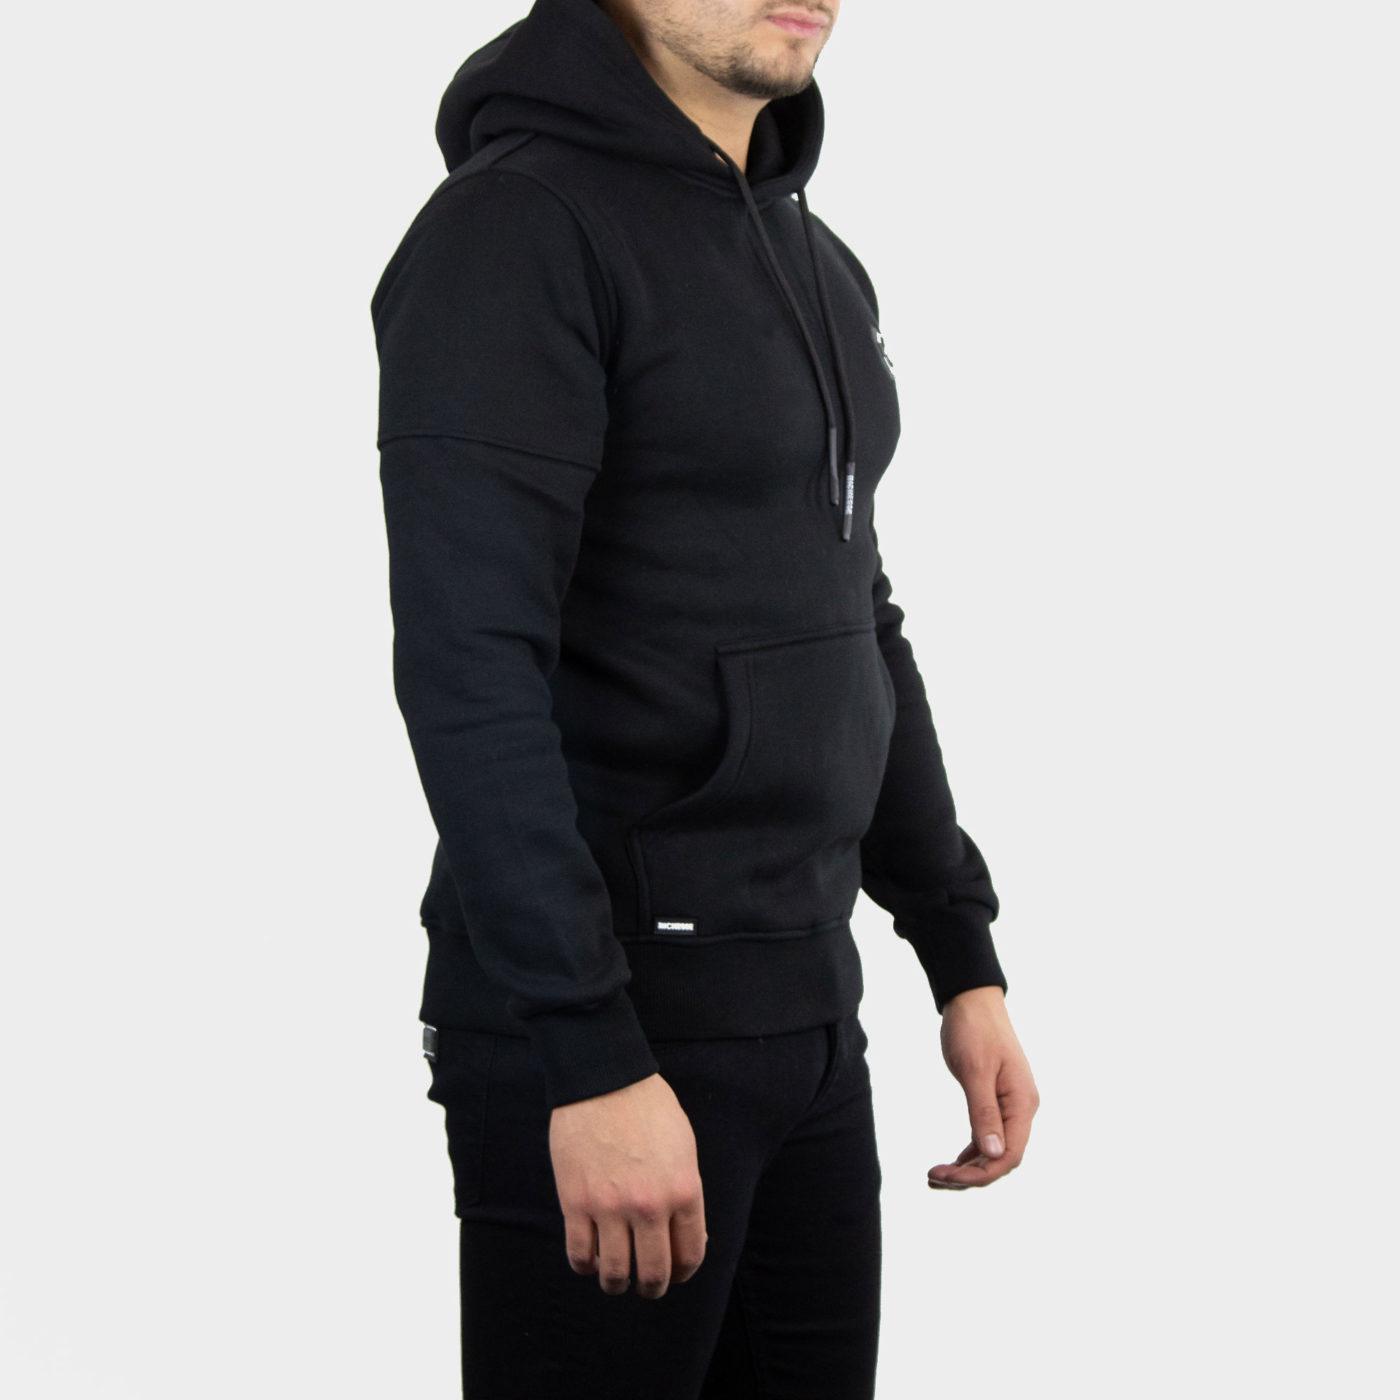 Richesse-Original-Hoodie-Black-2